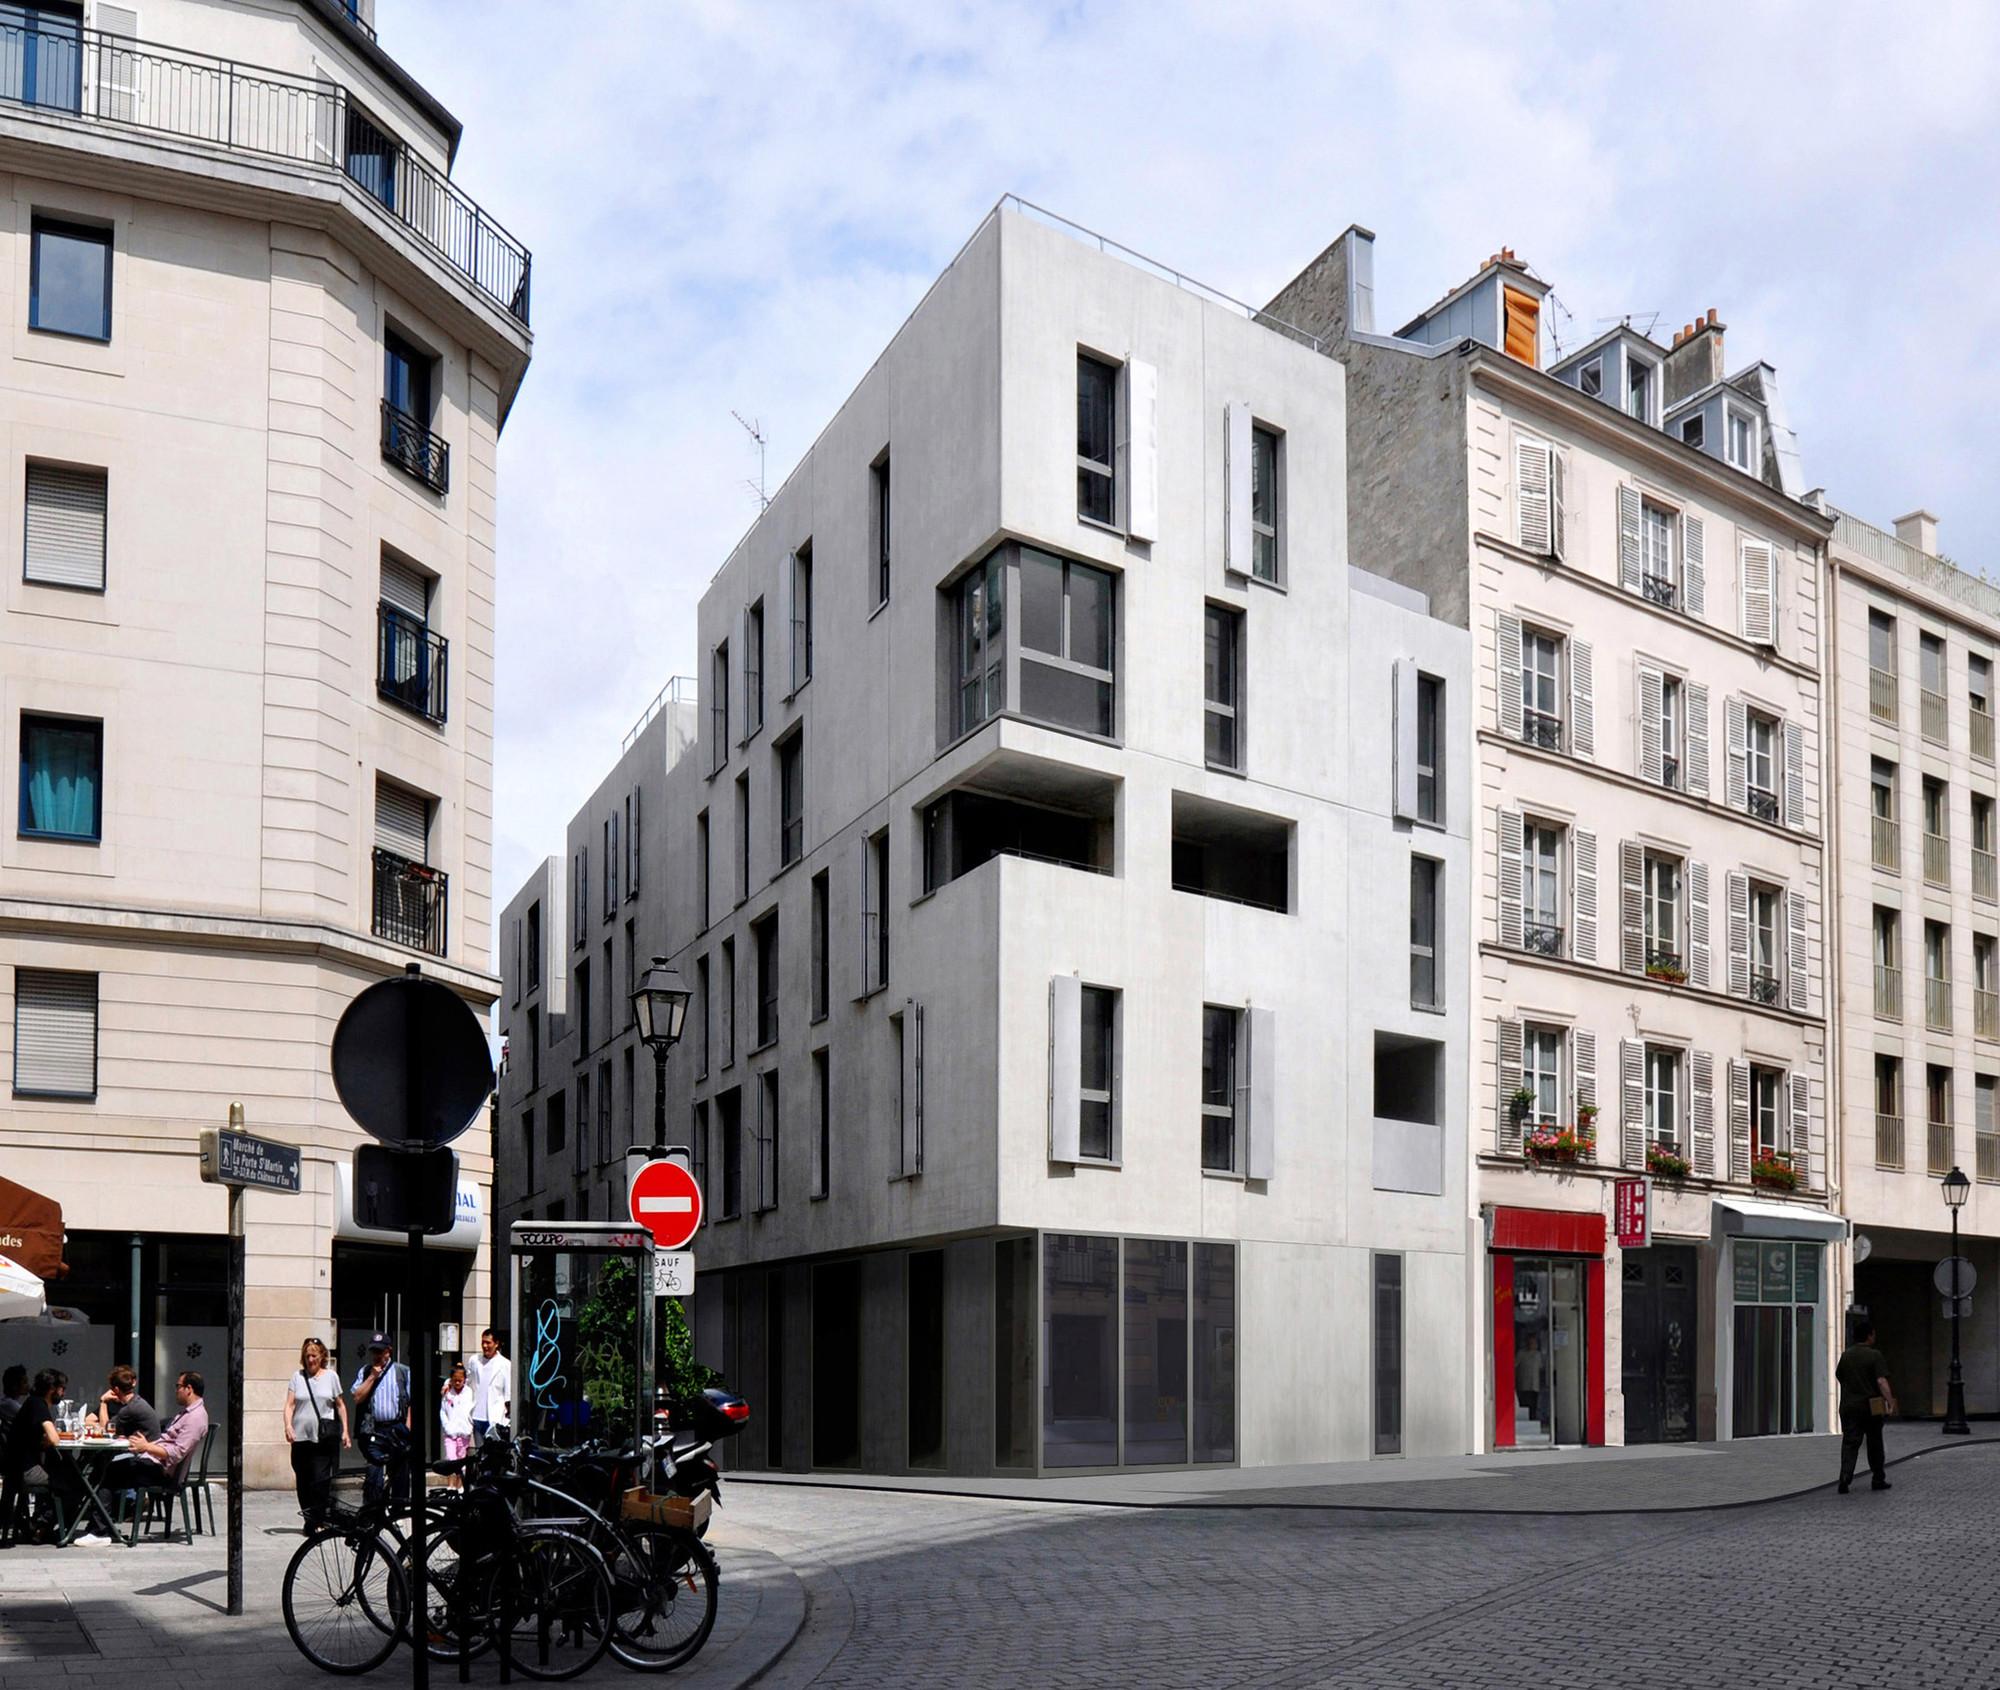 Social Housing / Frédéric Schlachet Architecte, © F. Schlachet